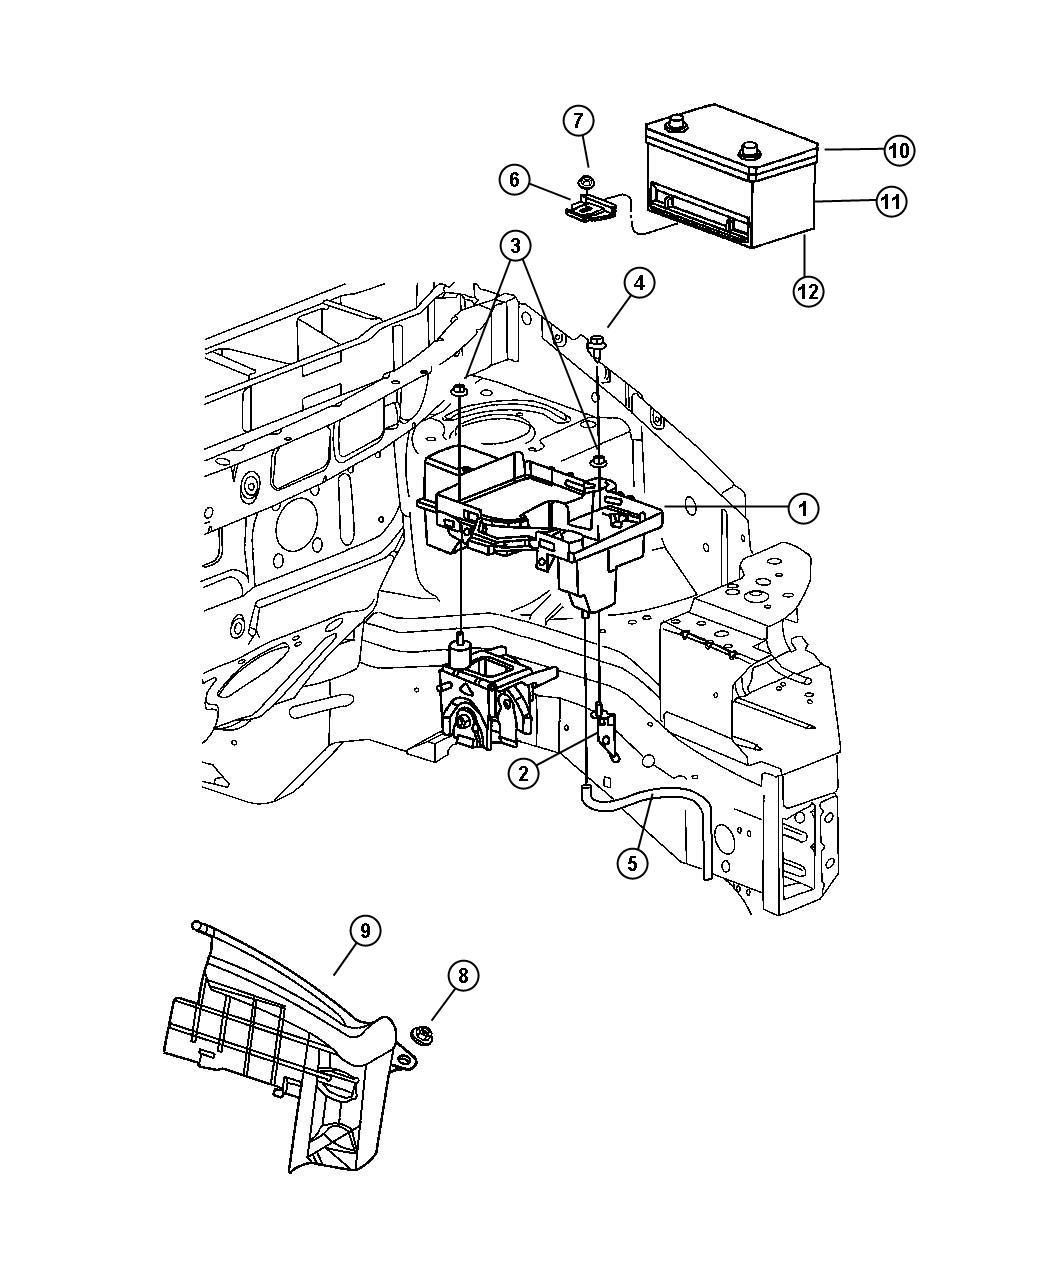 Chrysler Voyager LX 3.3L V6 SMPI FFV, 4-Spd. Automatic